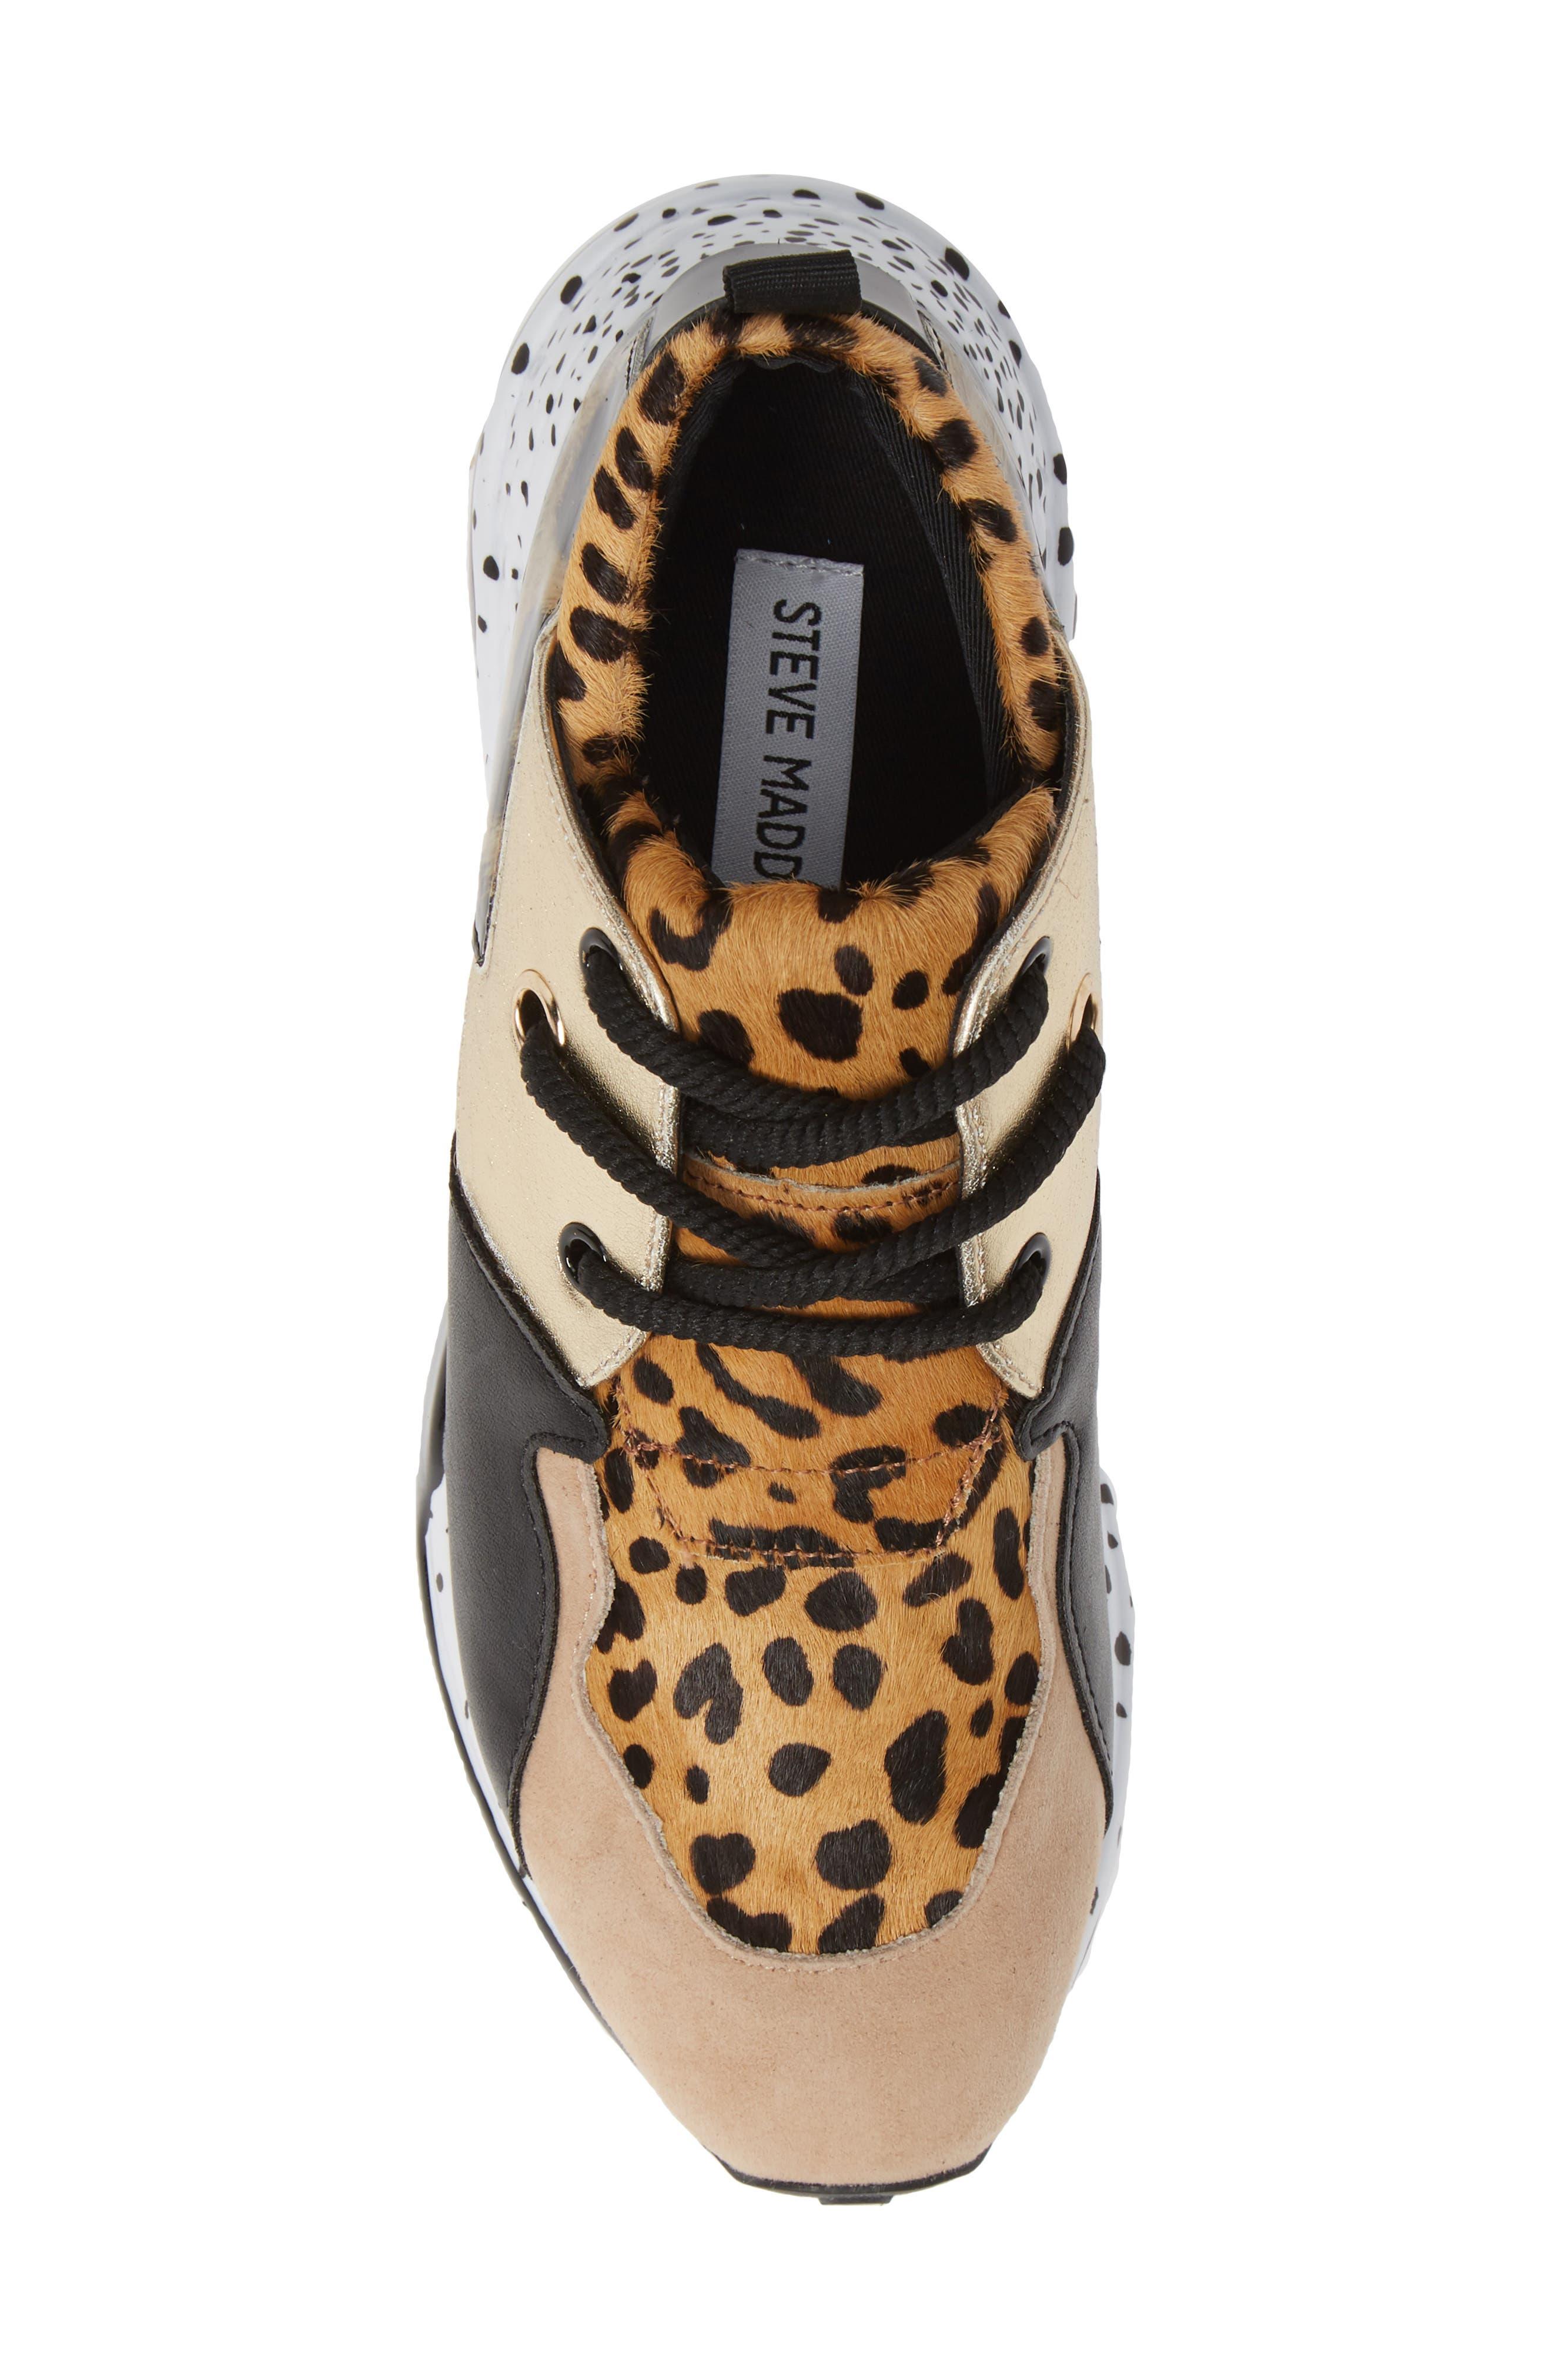 Cliff Genuine Calf Hair Sneaker,                             Alternate thumbnail 5, color,                             ANIMAL PRINT CALF HAIR